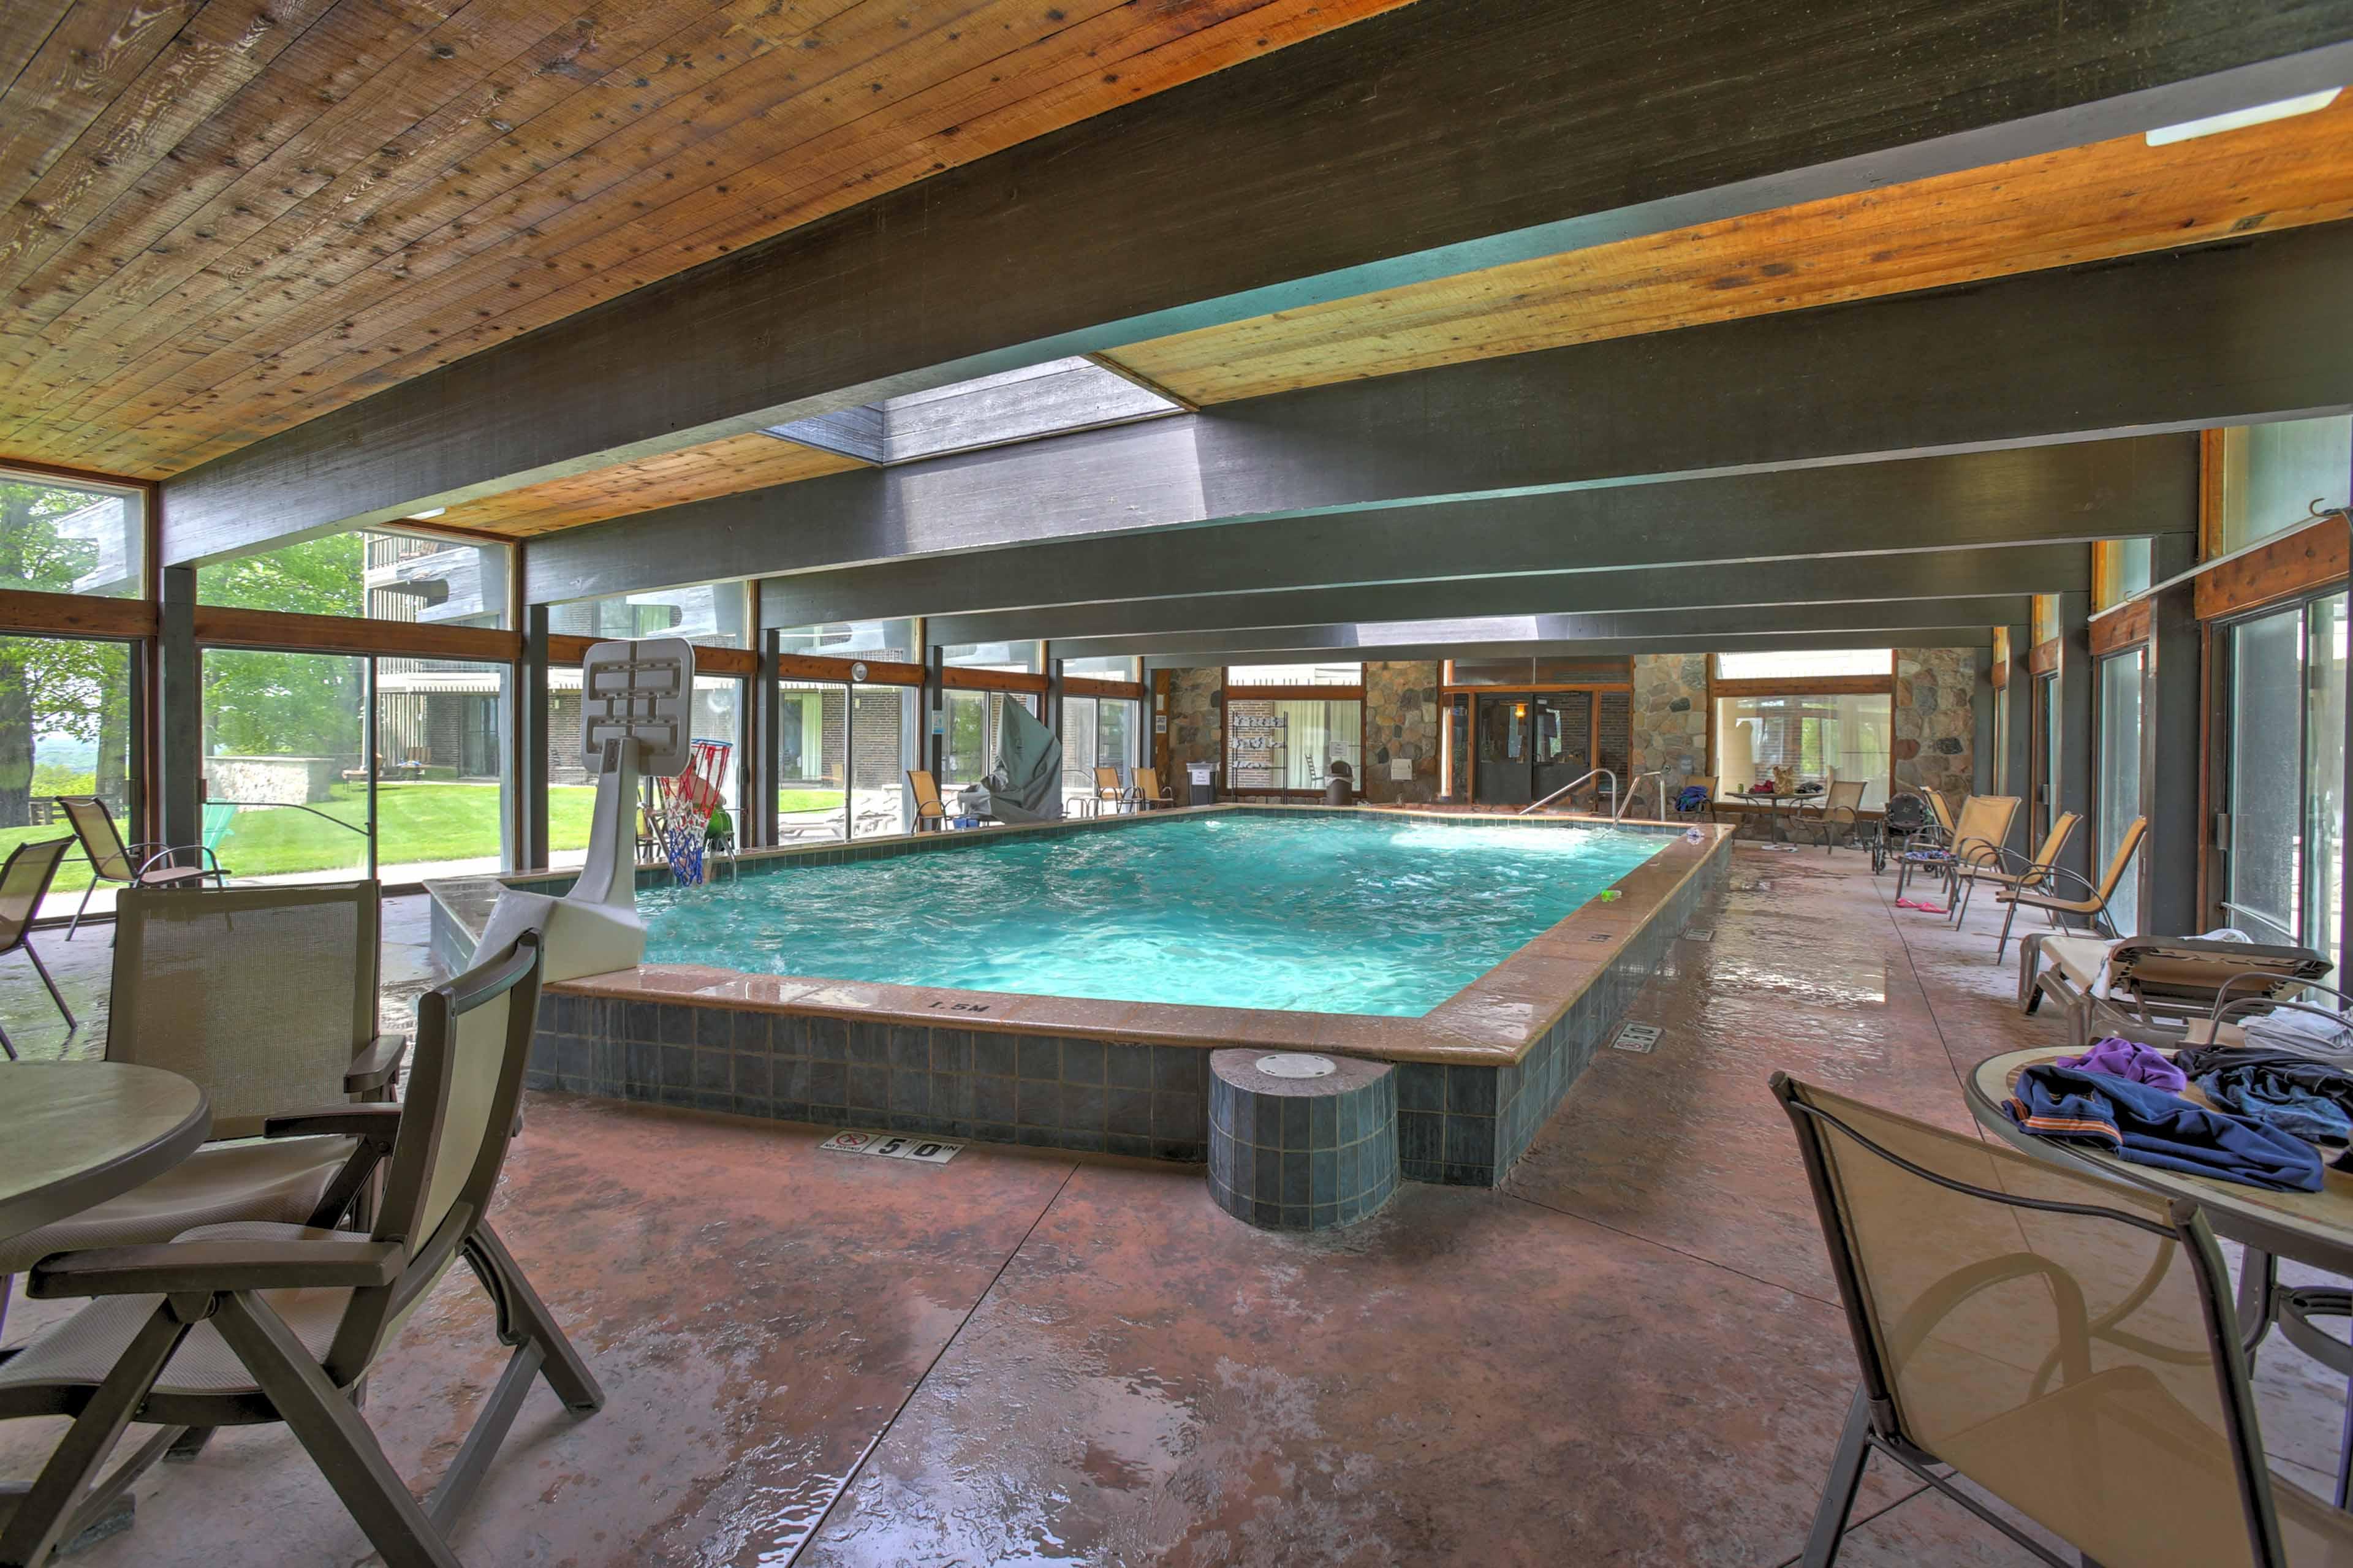 Resort amenities also include this indoor swimming pool.